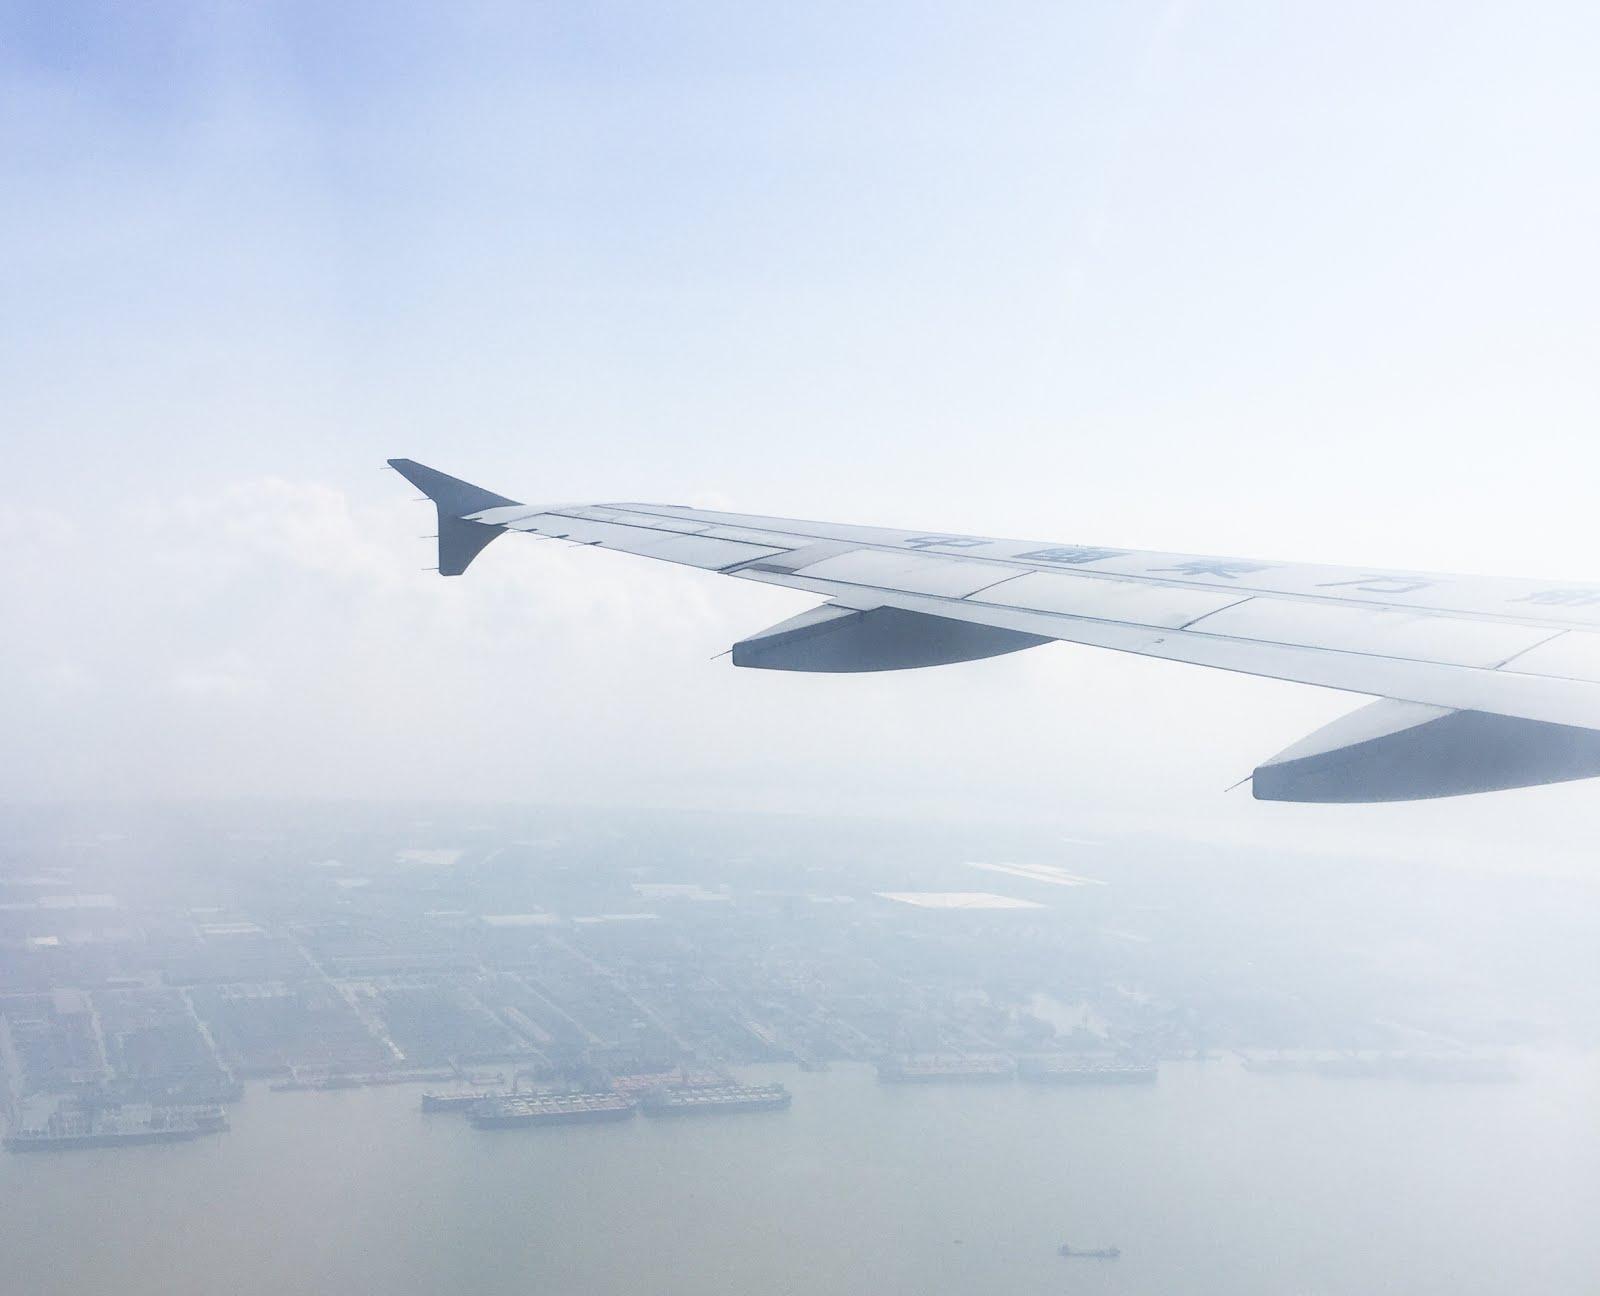 Shanghai Pudong Airport